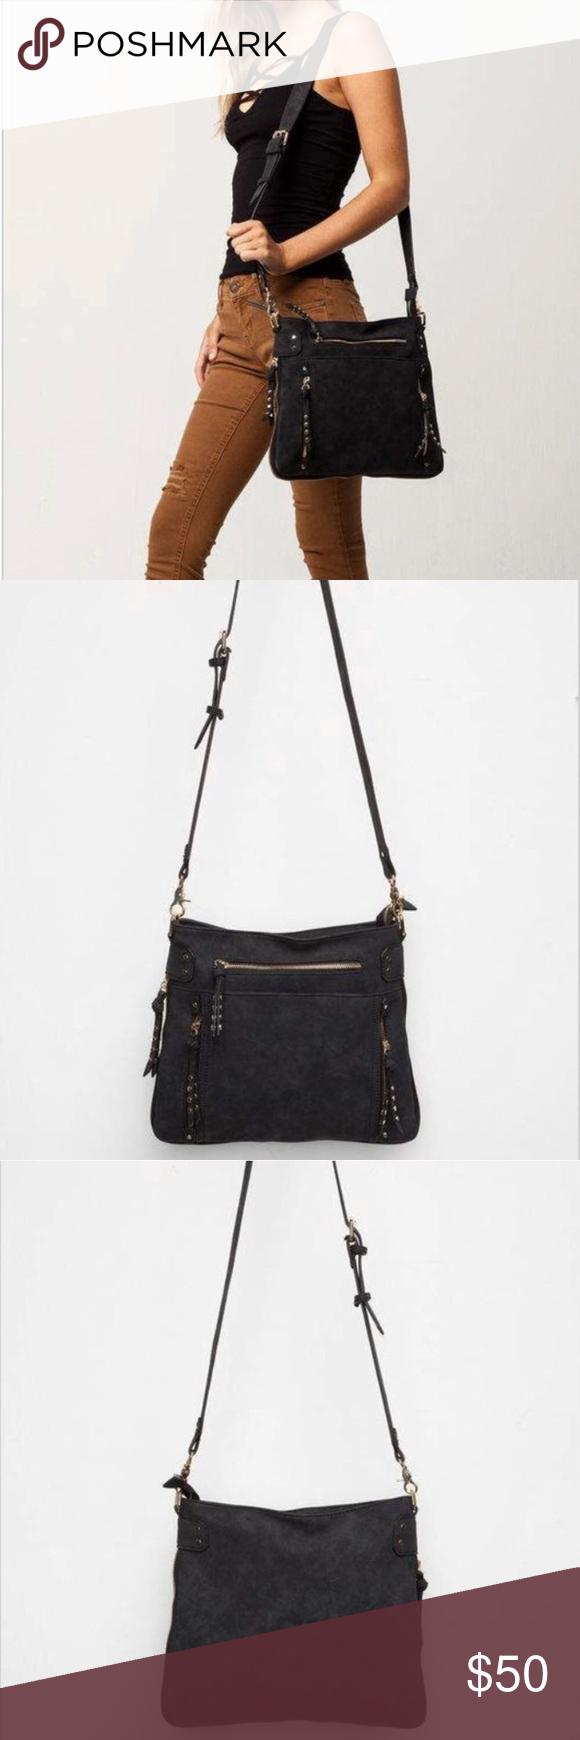 79bca450d8b1 Free People Randi Studded Crossbody Bag Free People line Violet Ray Randi faux  leather crossbody bag